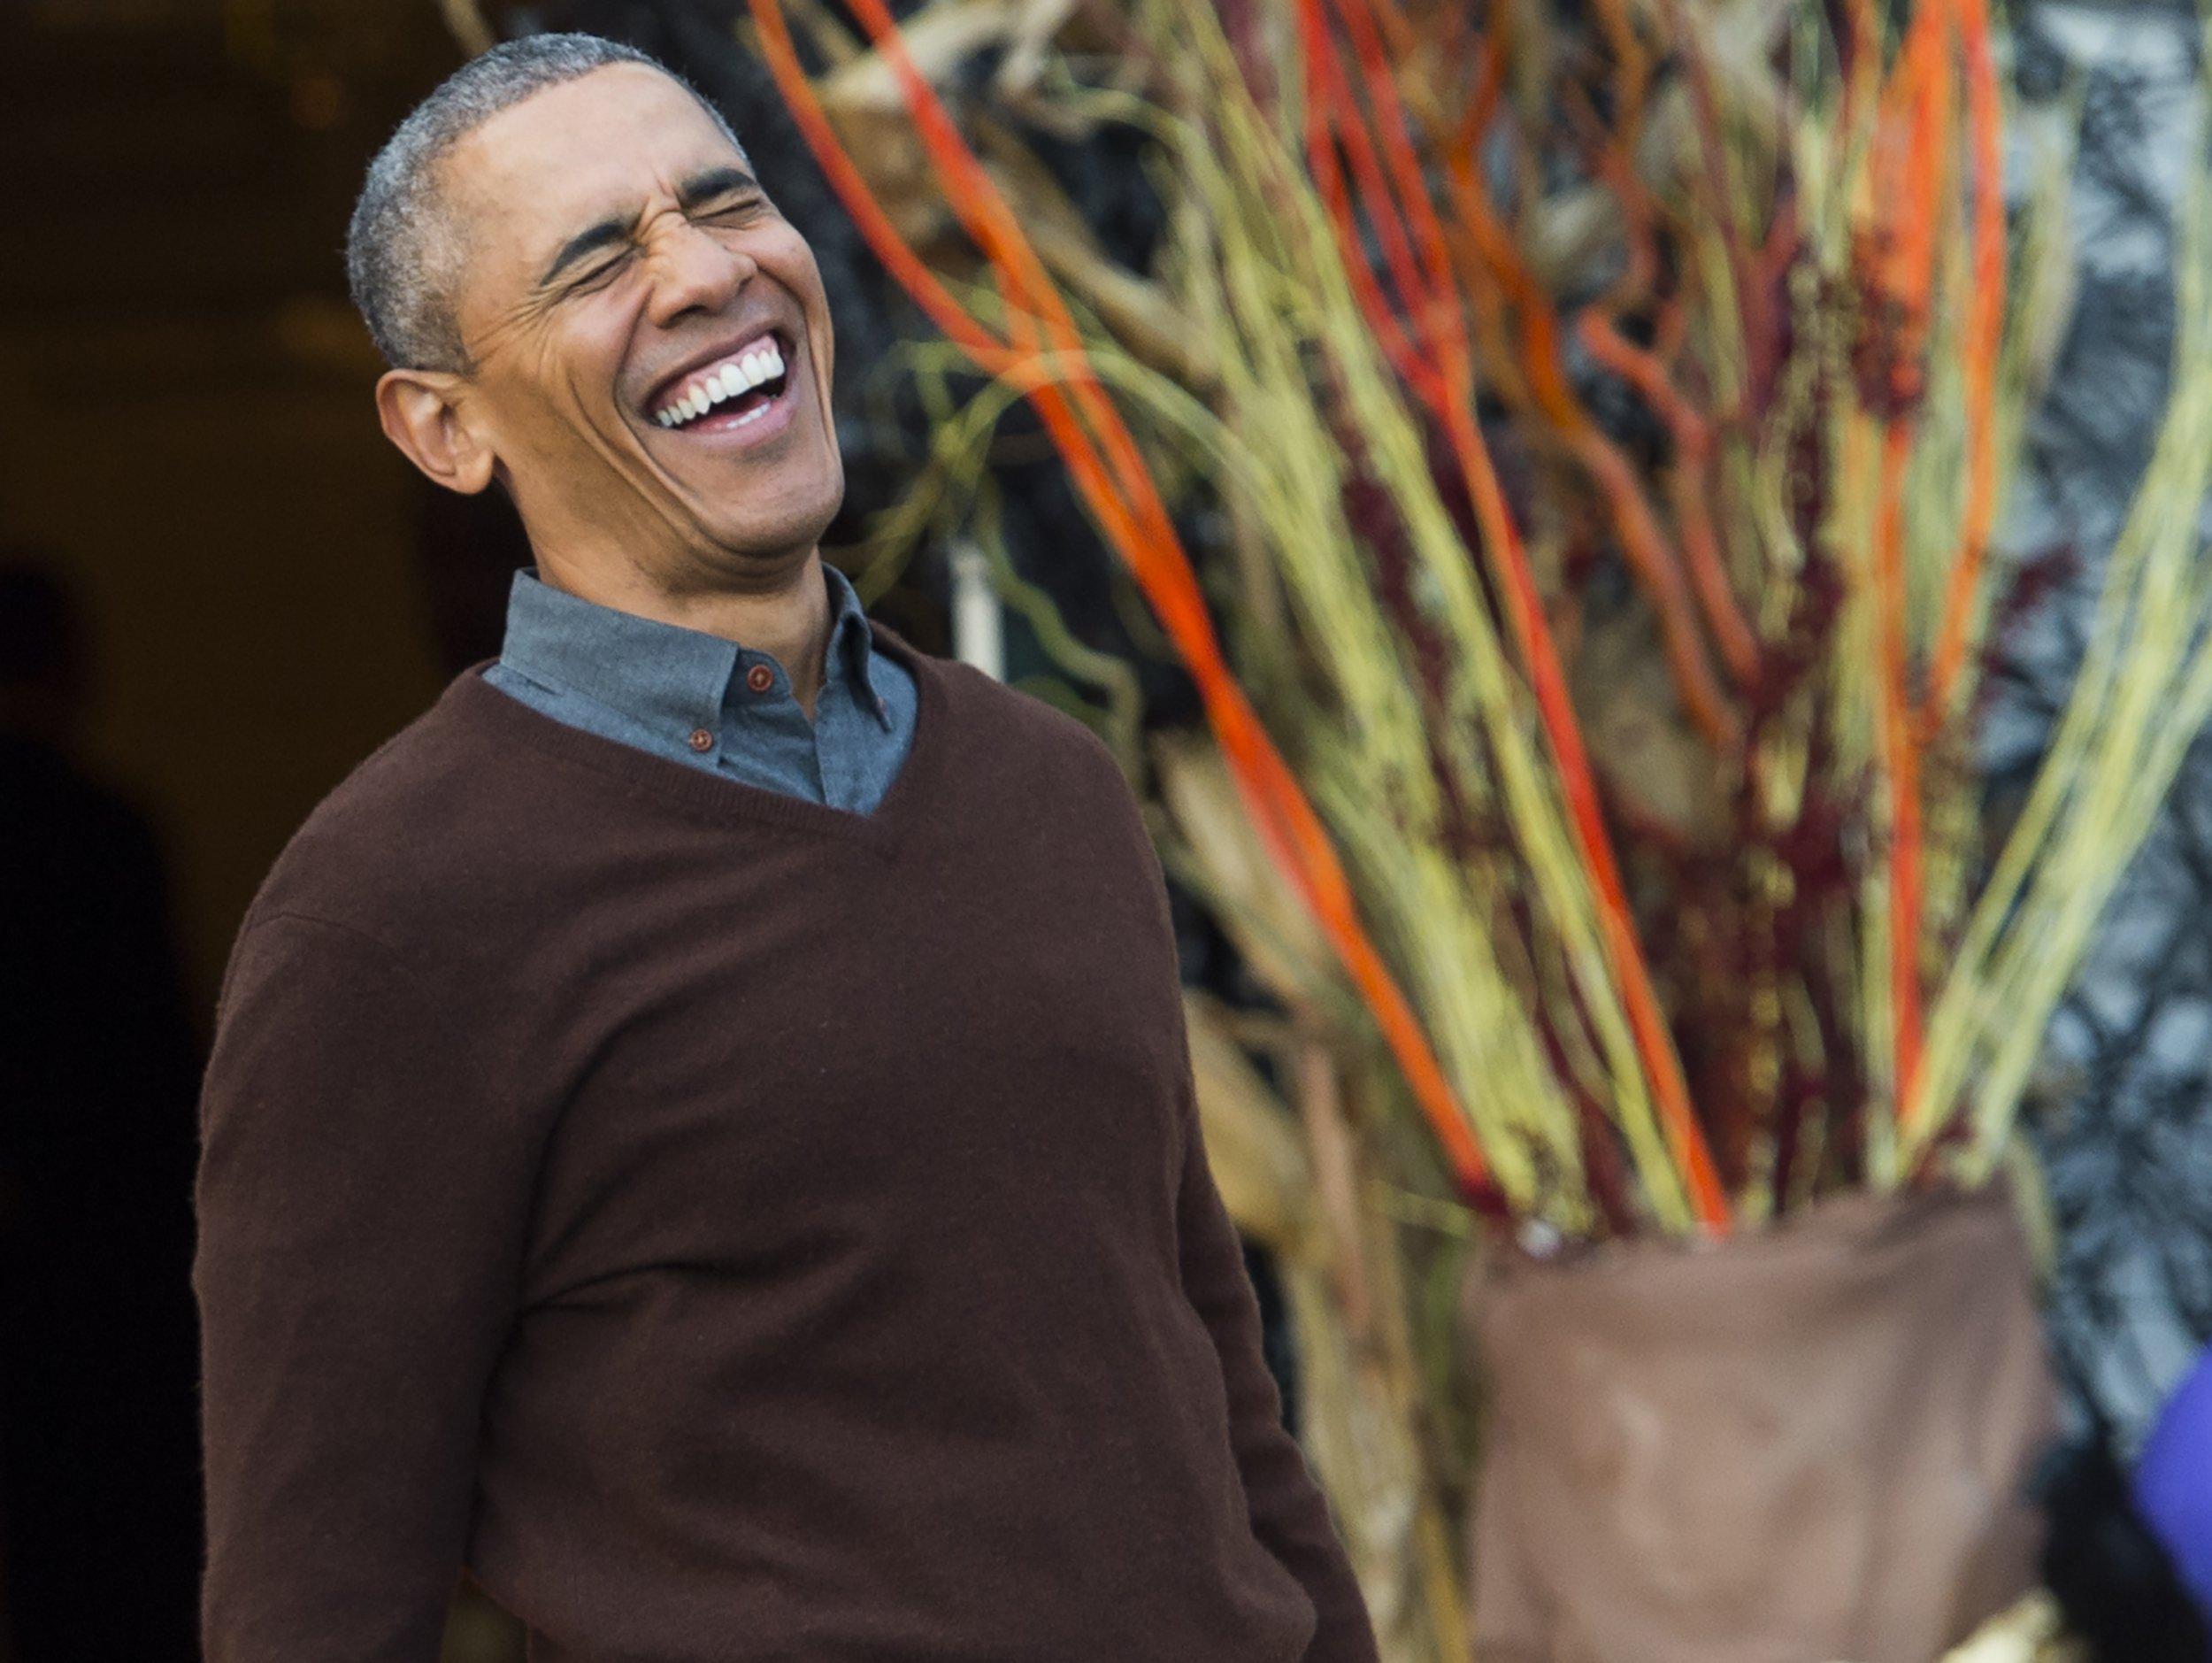 04_02_18_ObamaLaugh